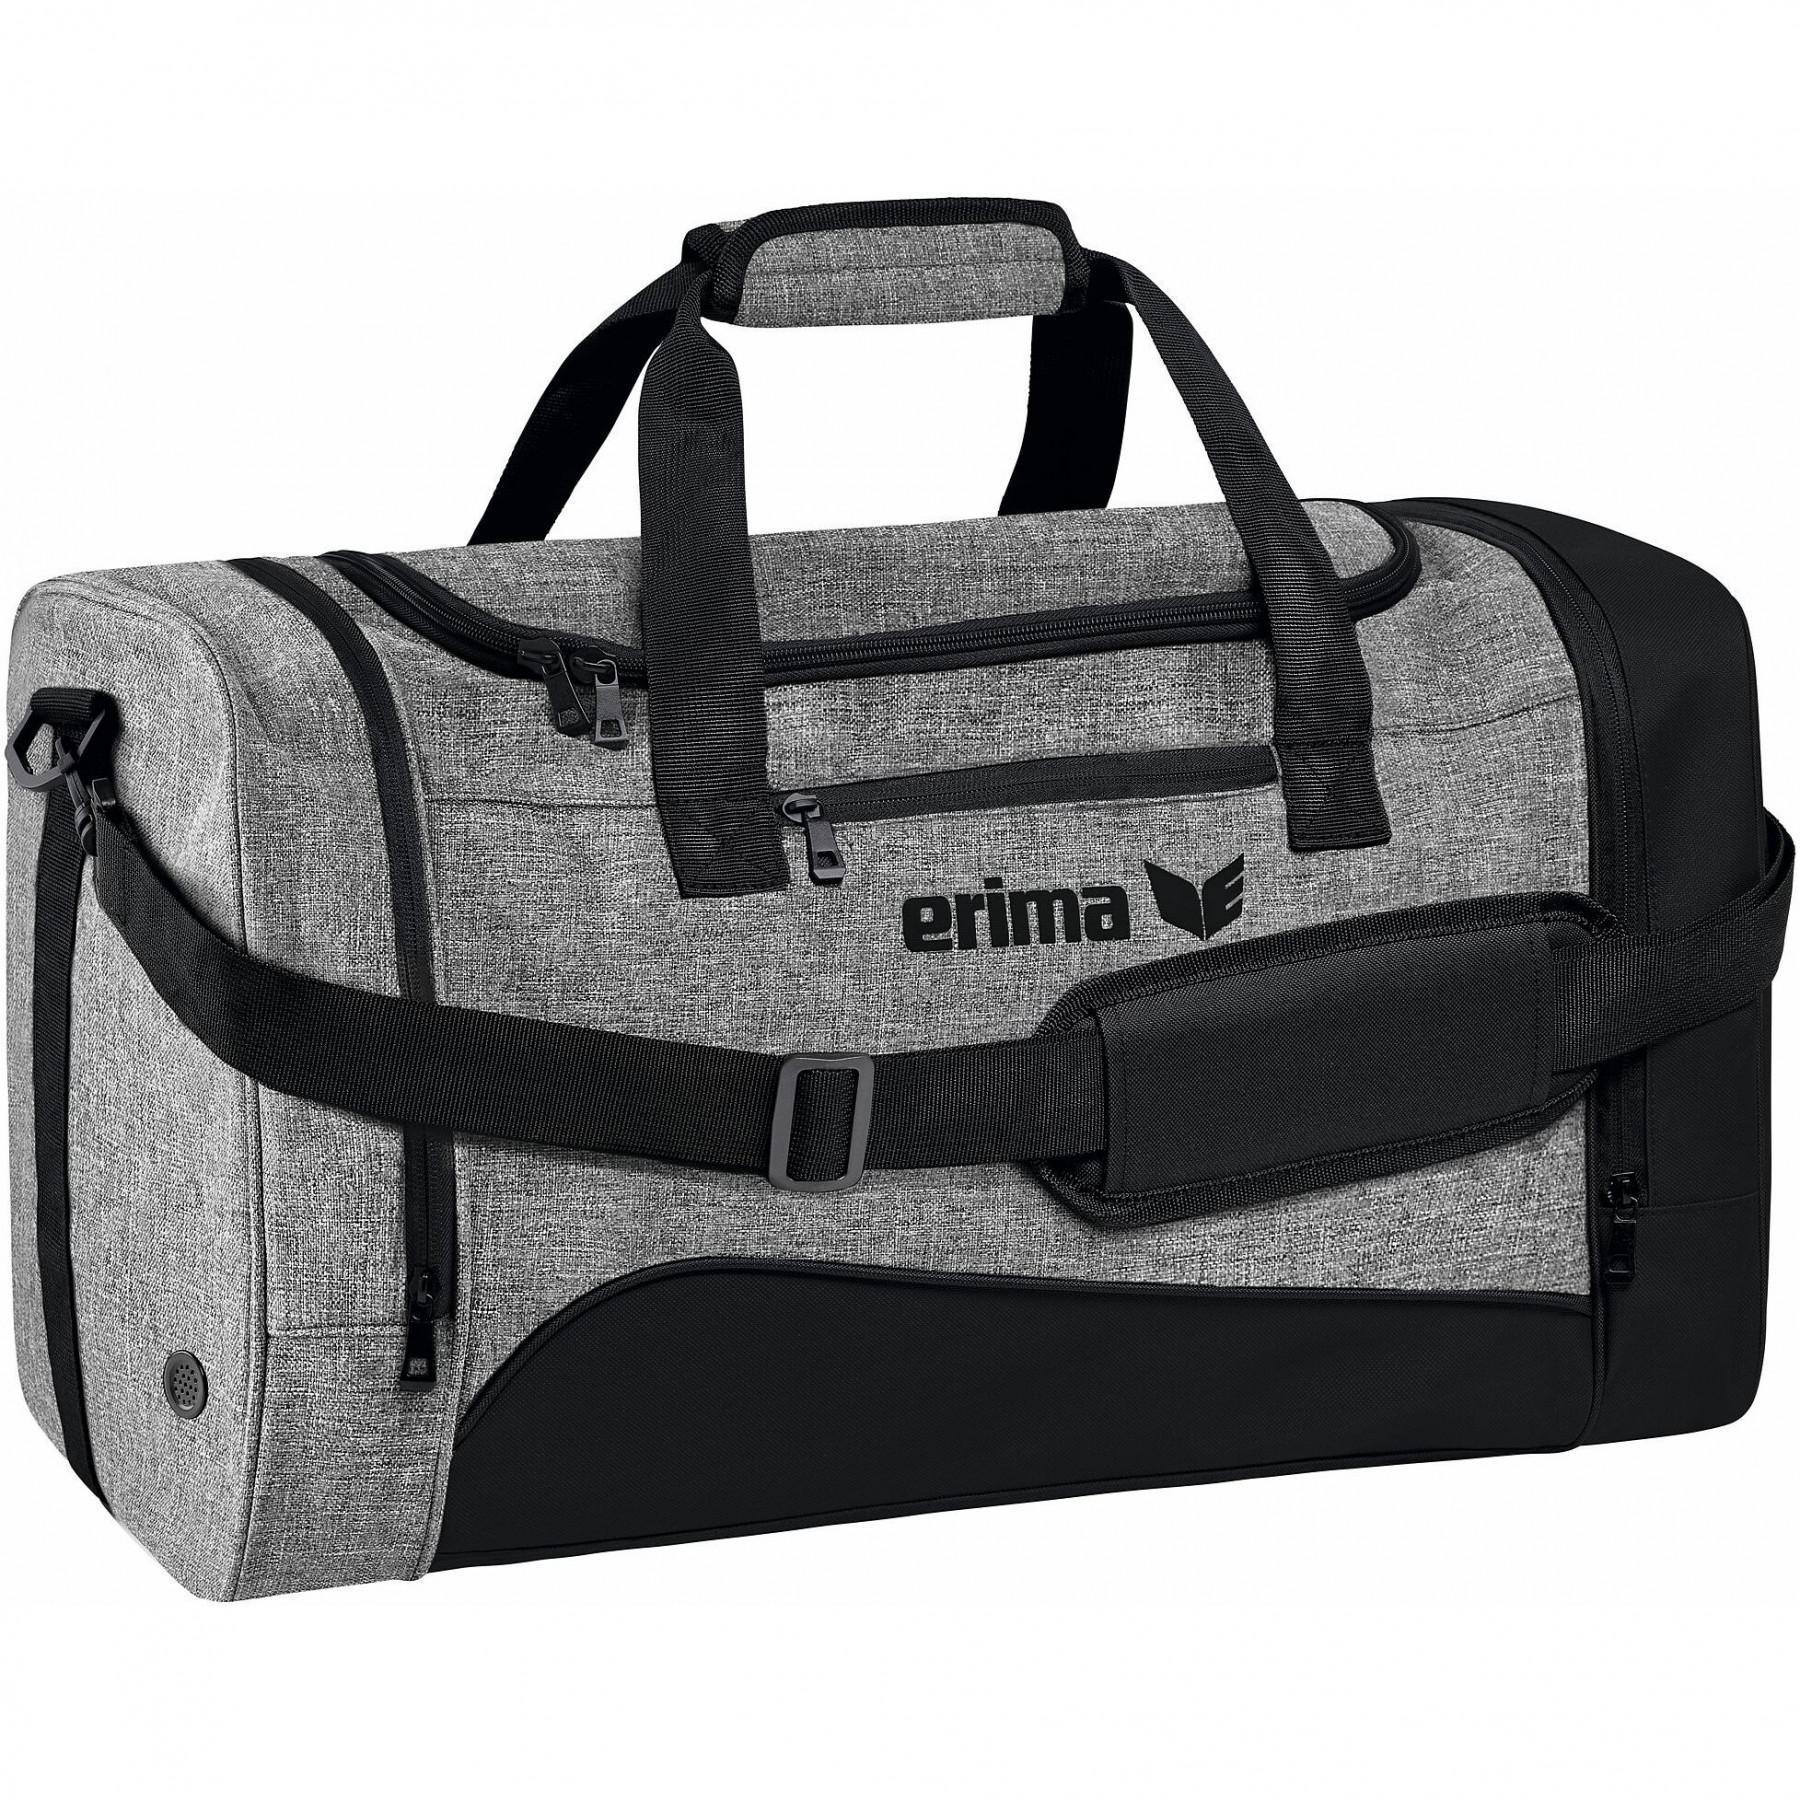 Sports bag Erima Club 1900 2.0